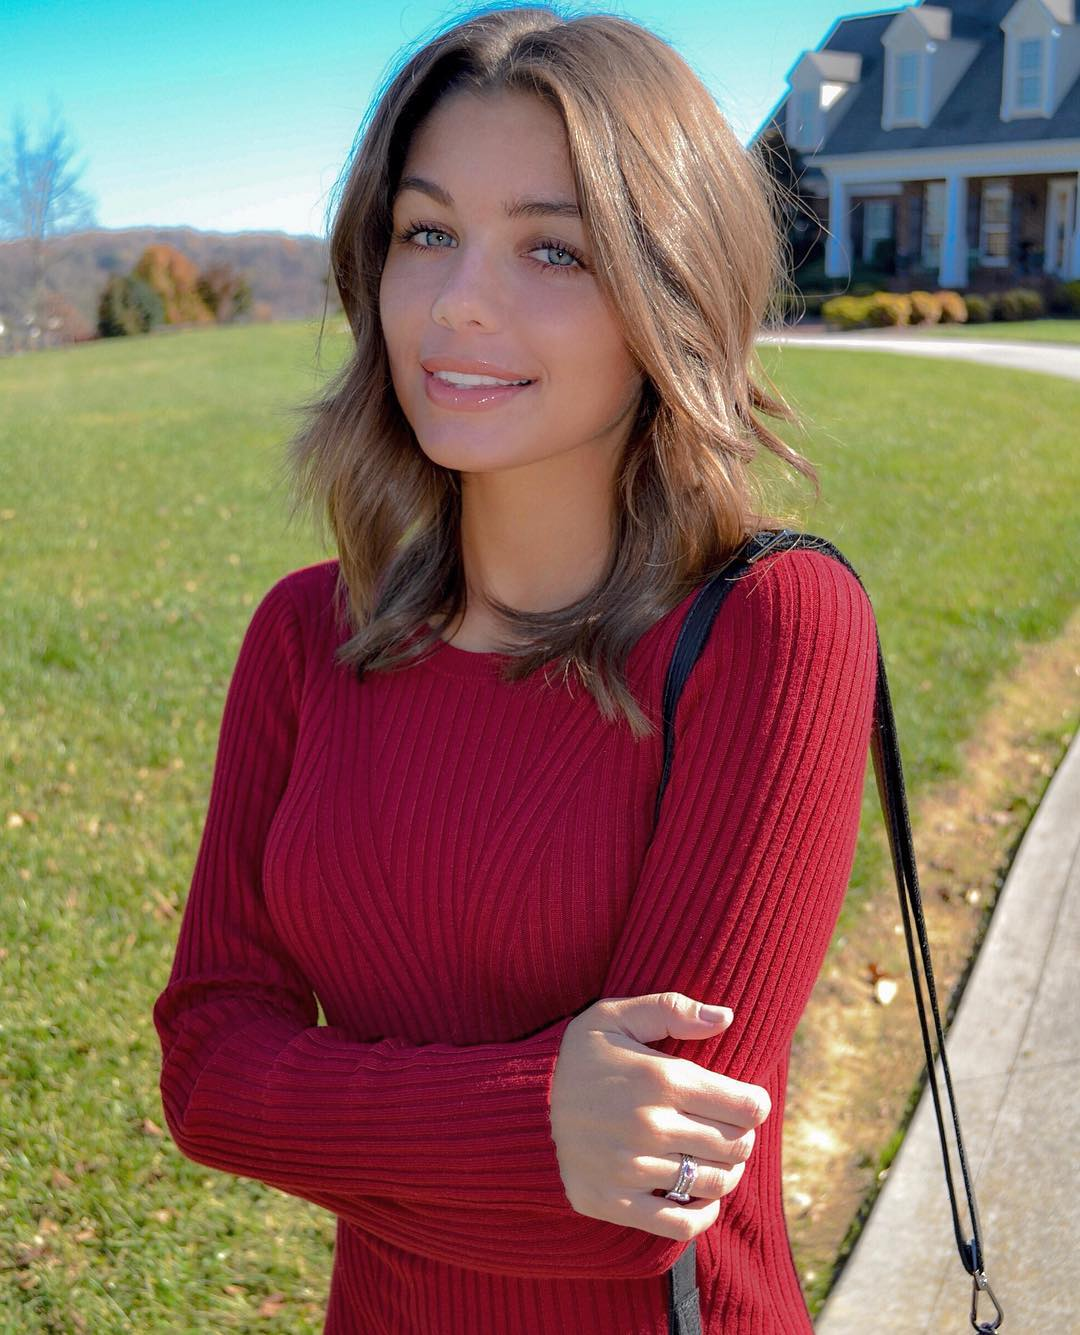 Hannah Ann Sluss